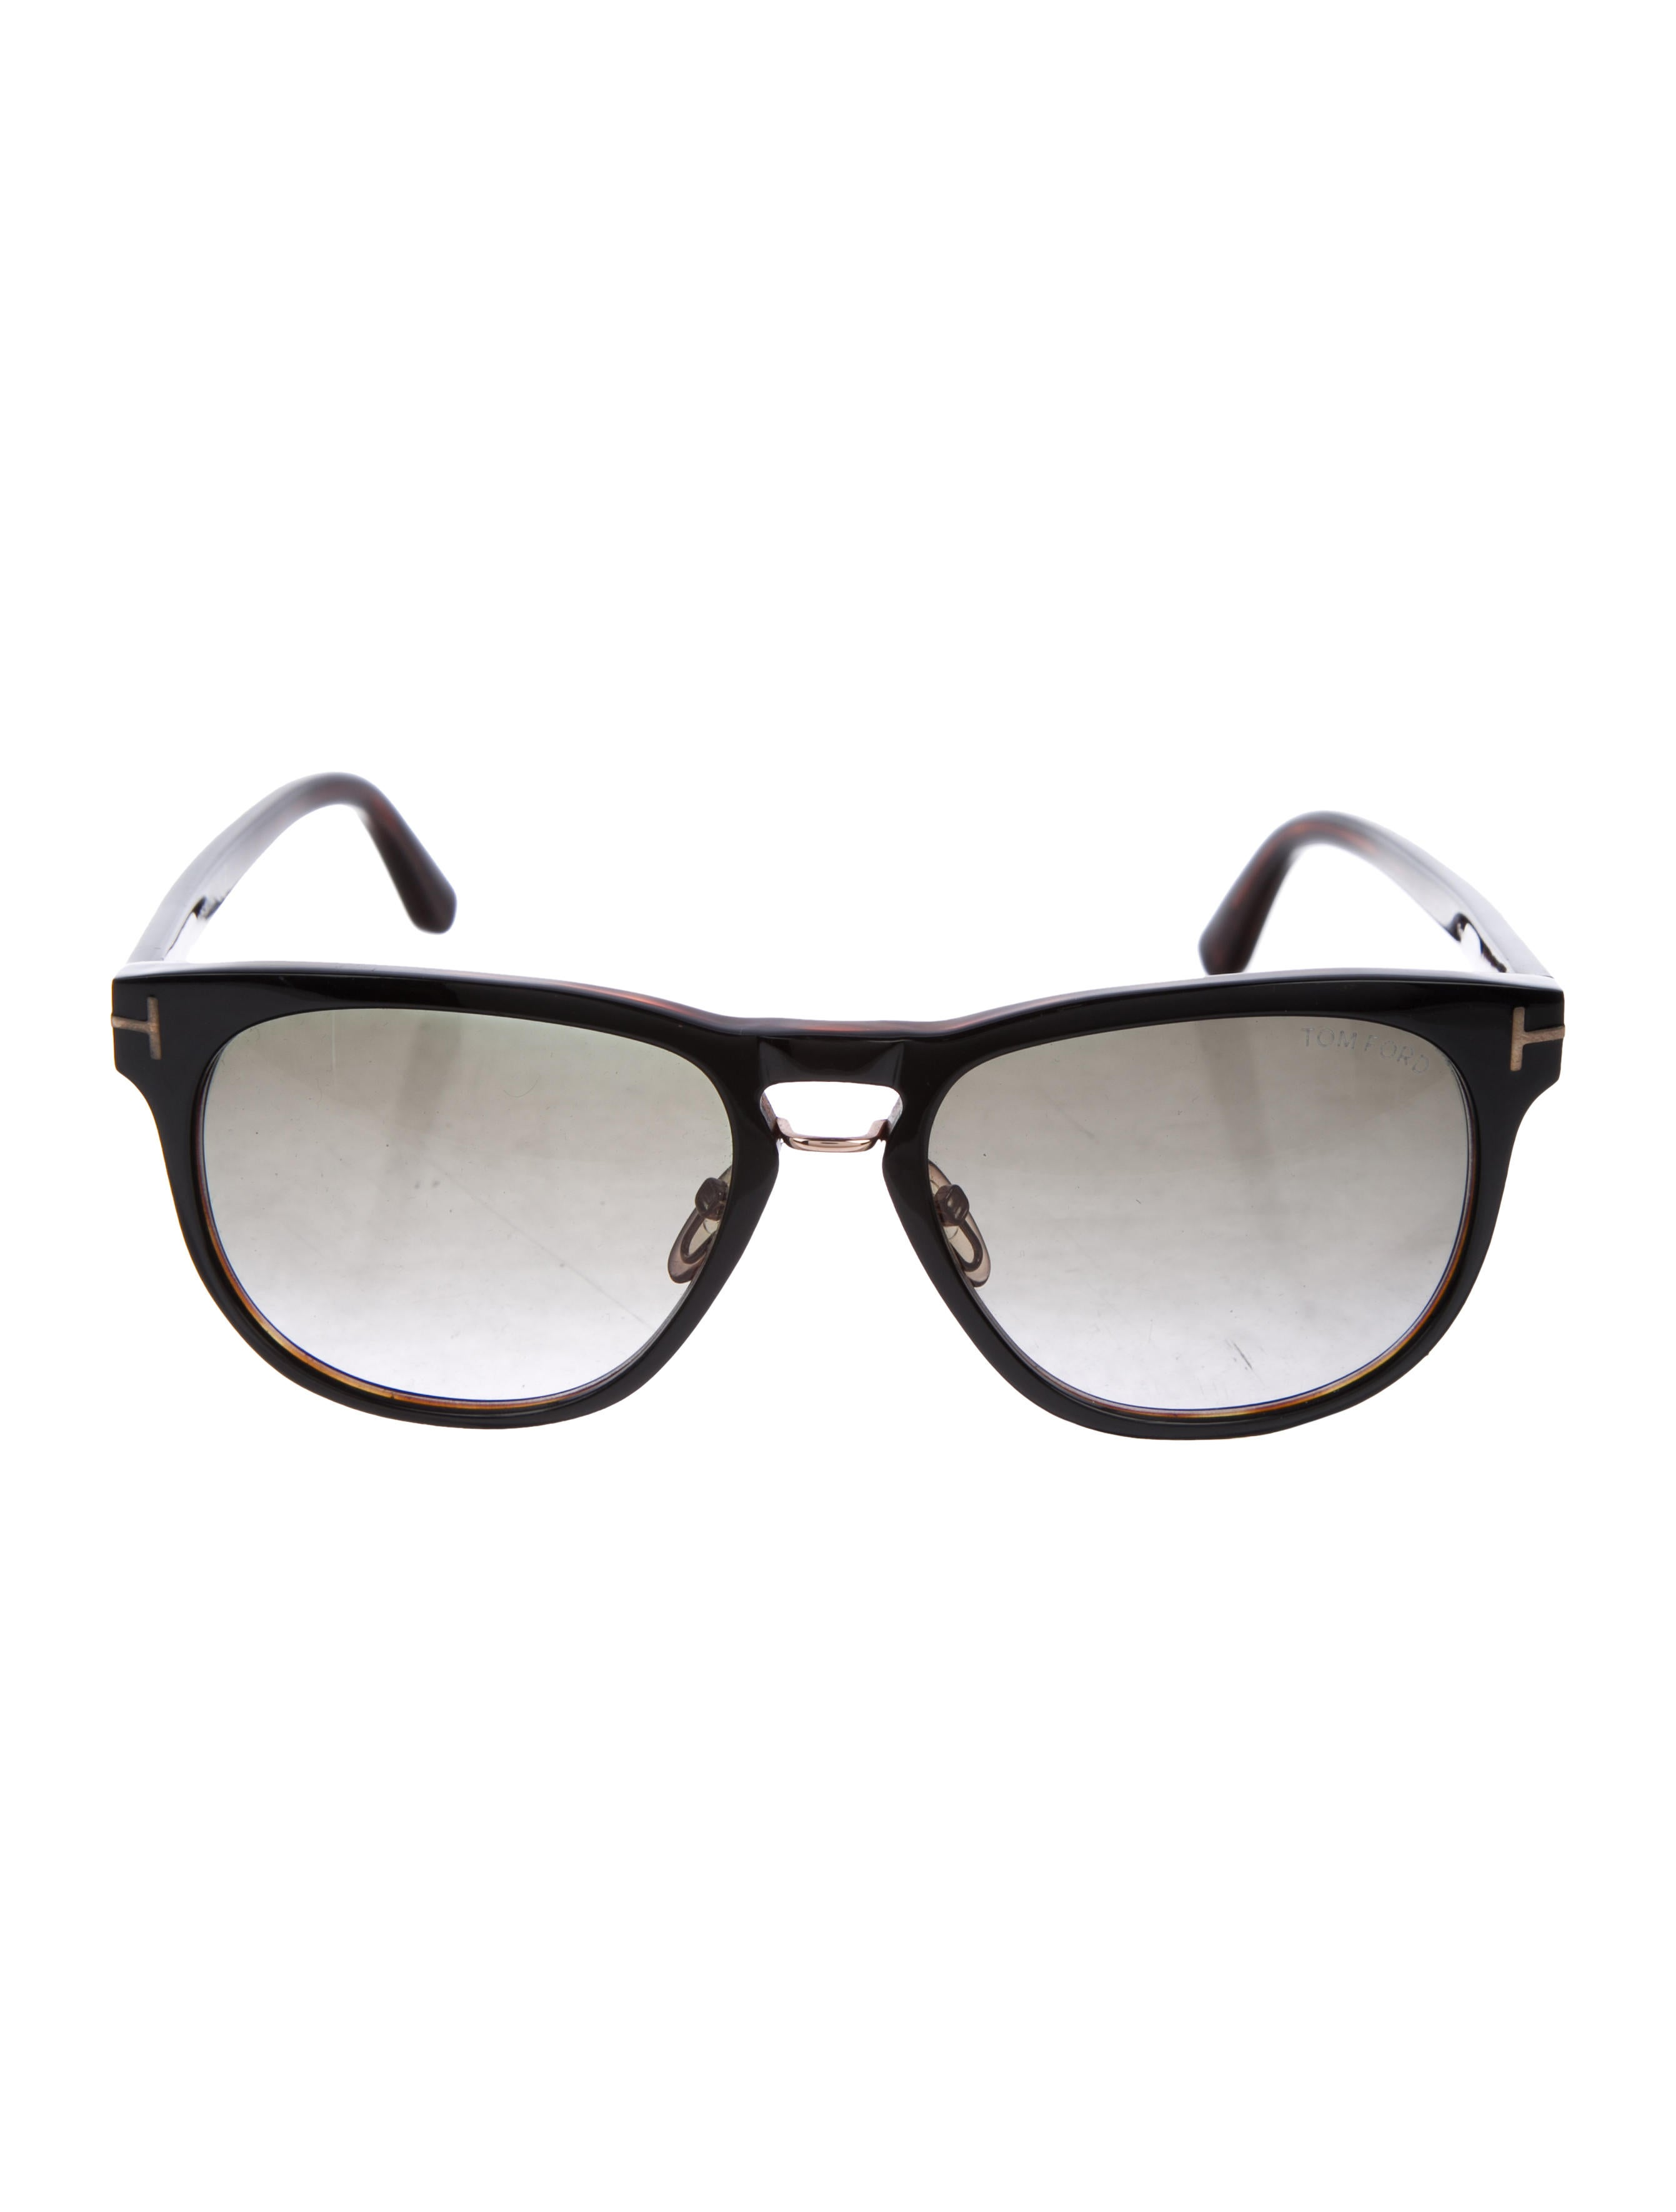 fcd73ecf62 Men · Accessories  Tom Ford Franklin Tinted Sunglasses. Franklin Tinted  Sunglasses